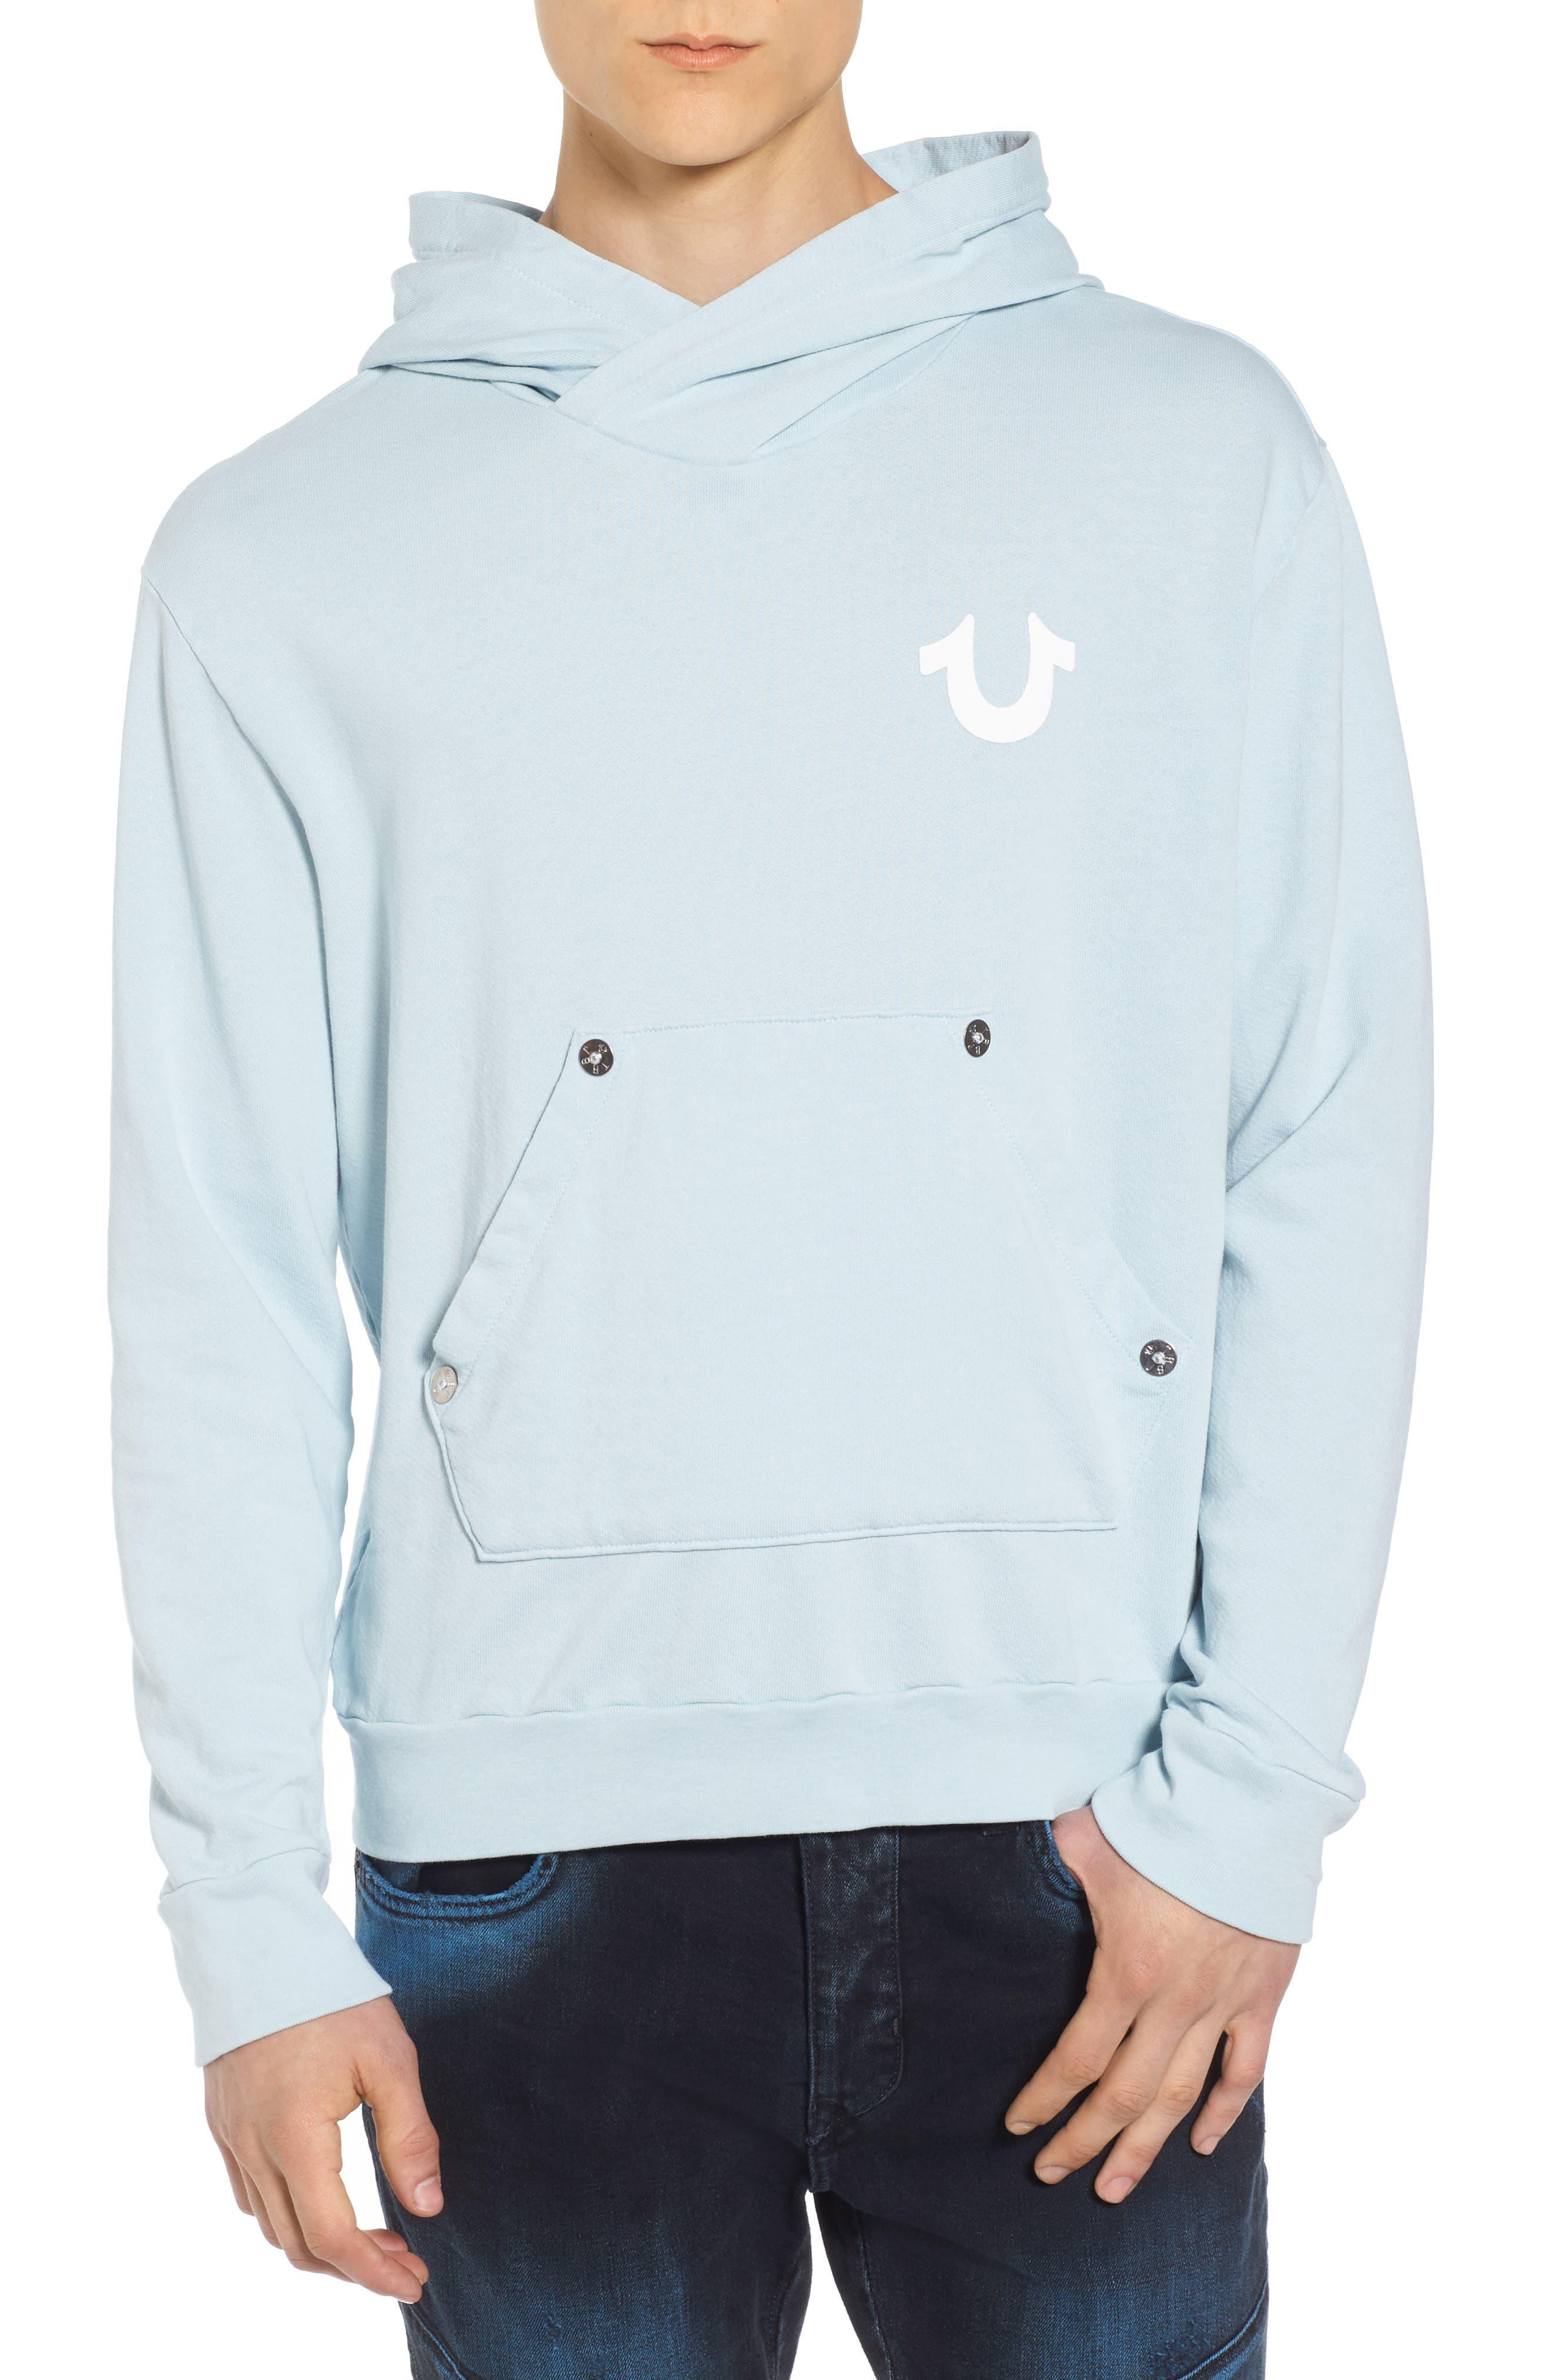 Core Hoodie,                         Main,                         color, Pale Blue W/ White